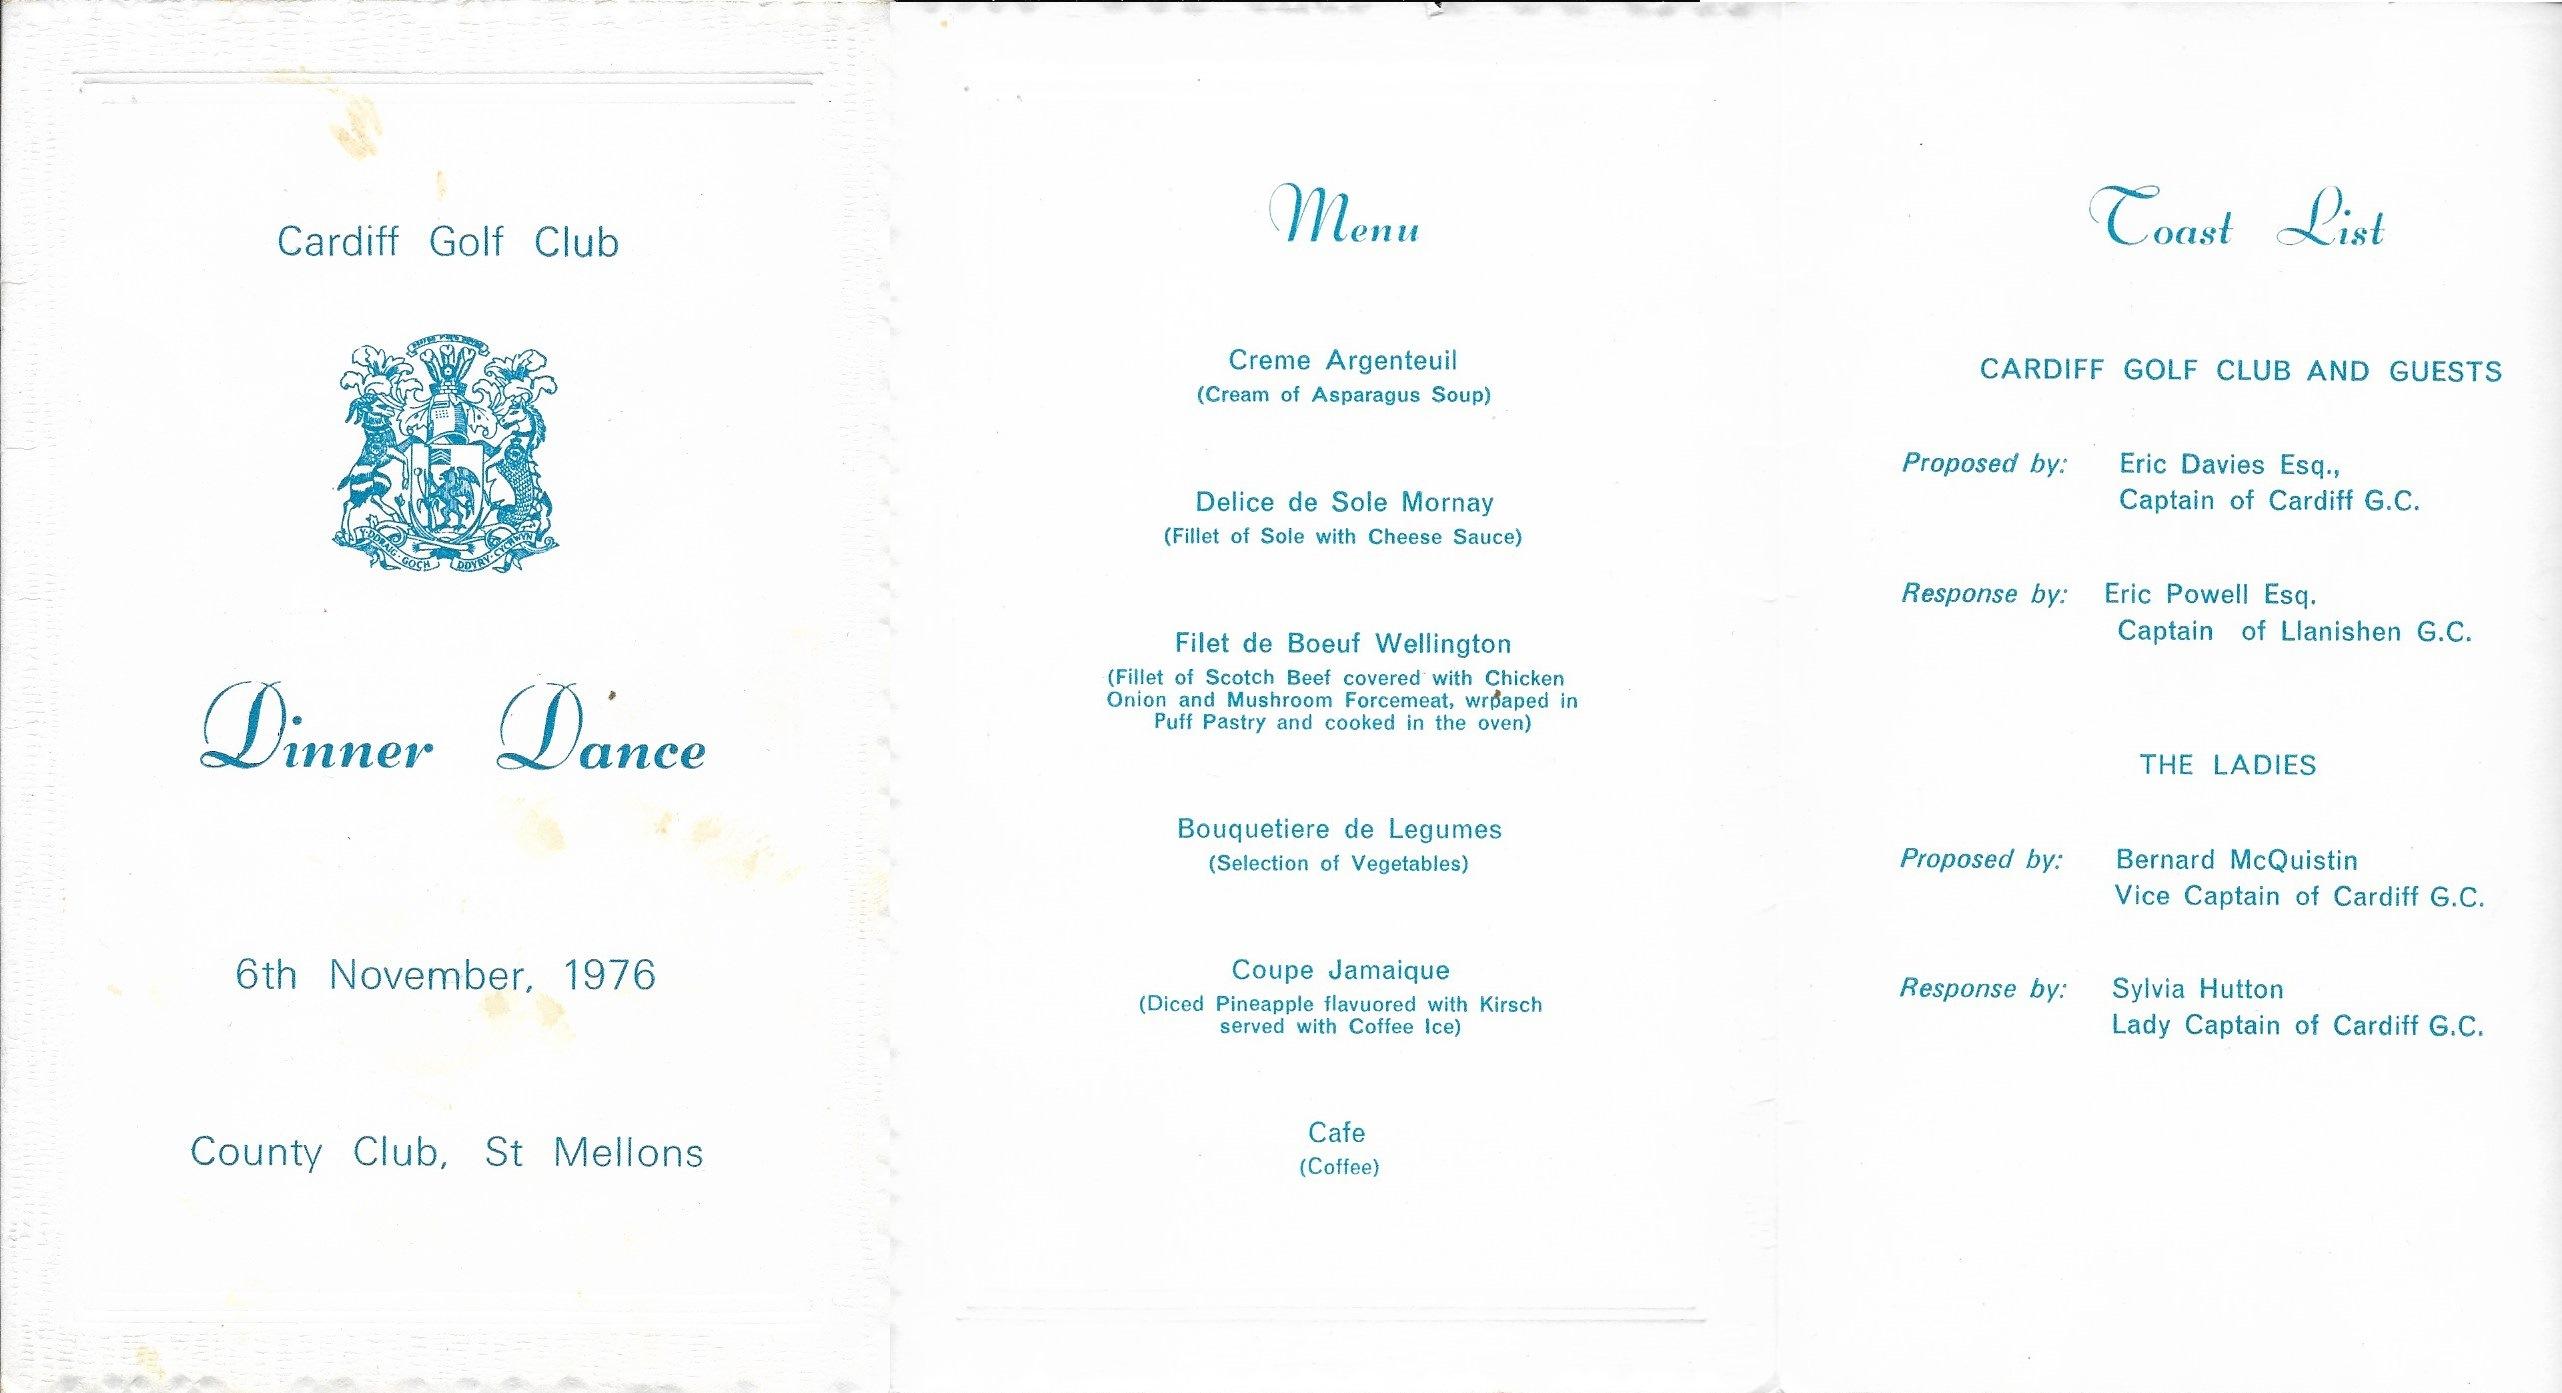 Annual Dinner Dance 1976